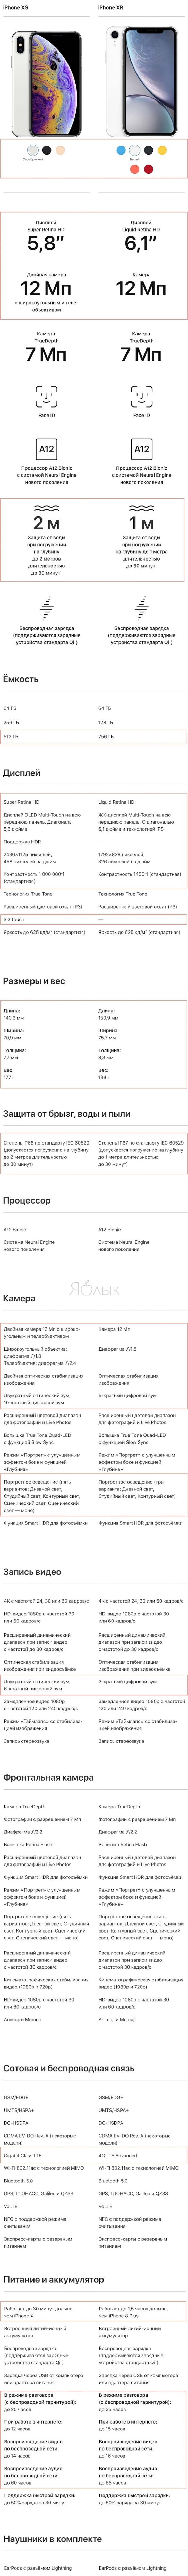 Подробное сравнение характеристик (спецификаций) iPhone XS и iPhone XR